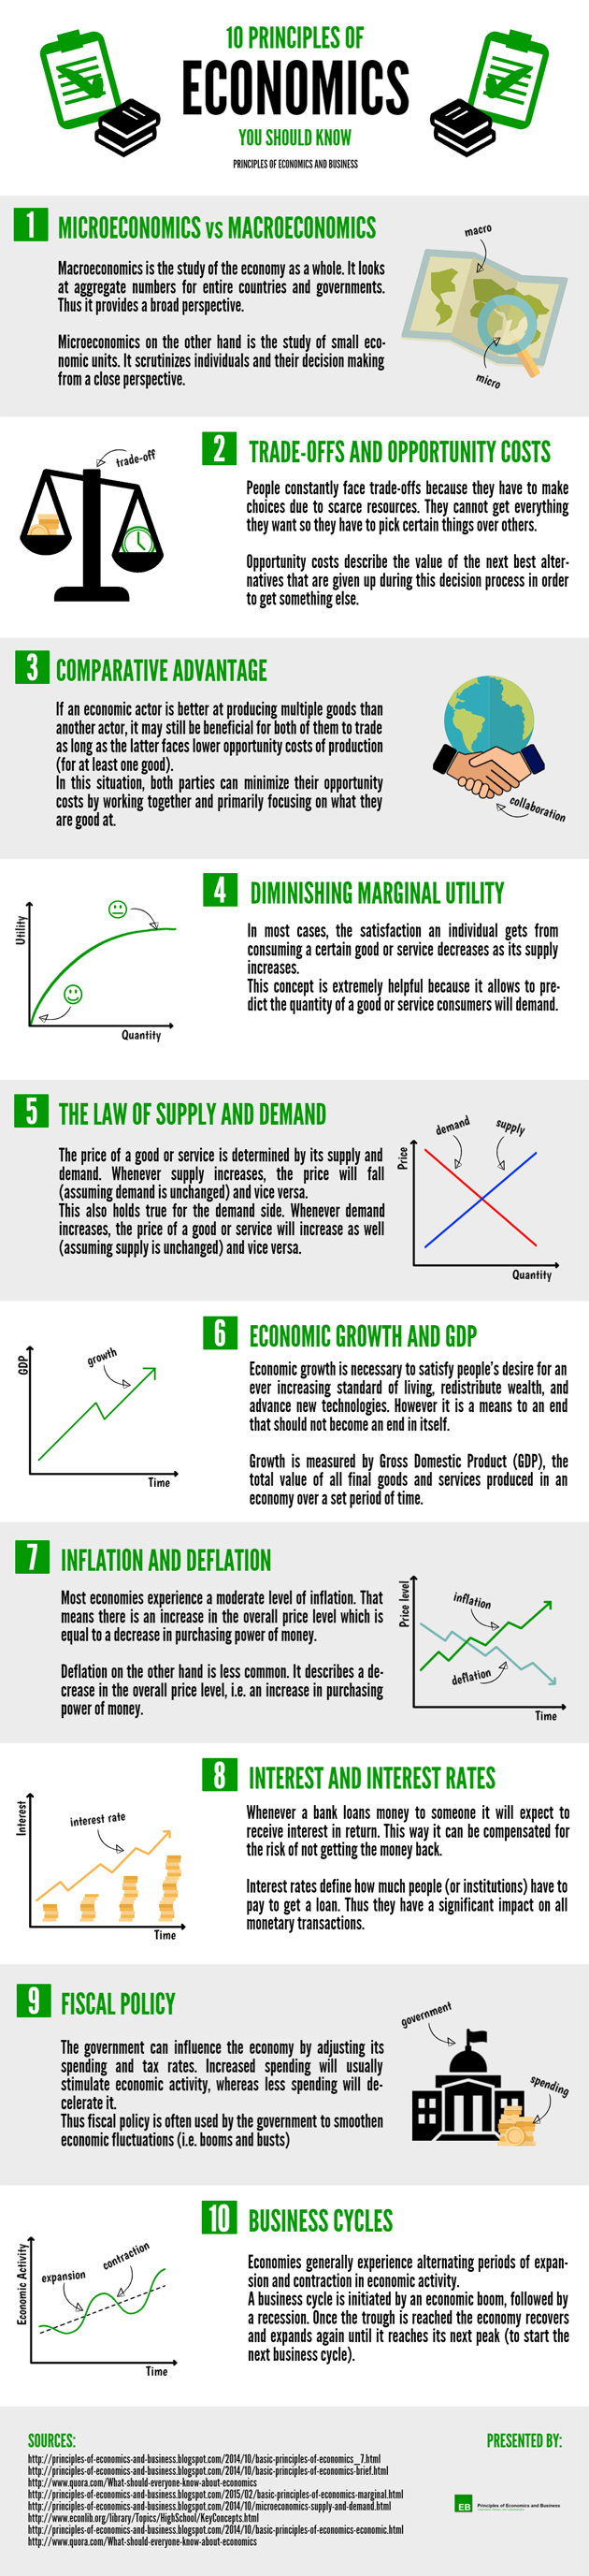 10 principles of finance